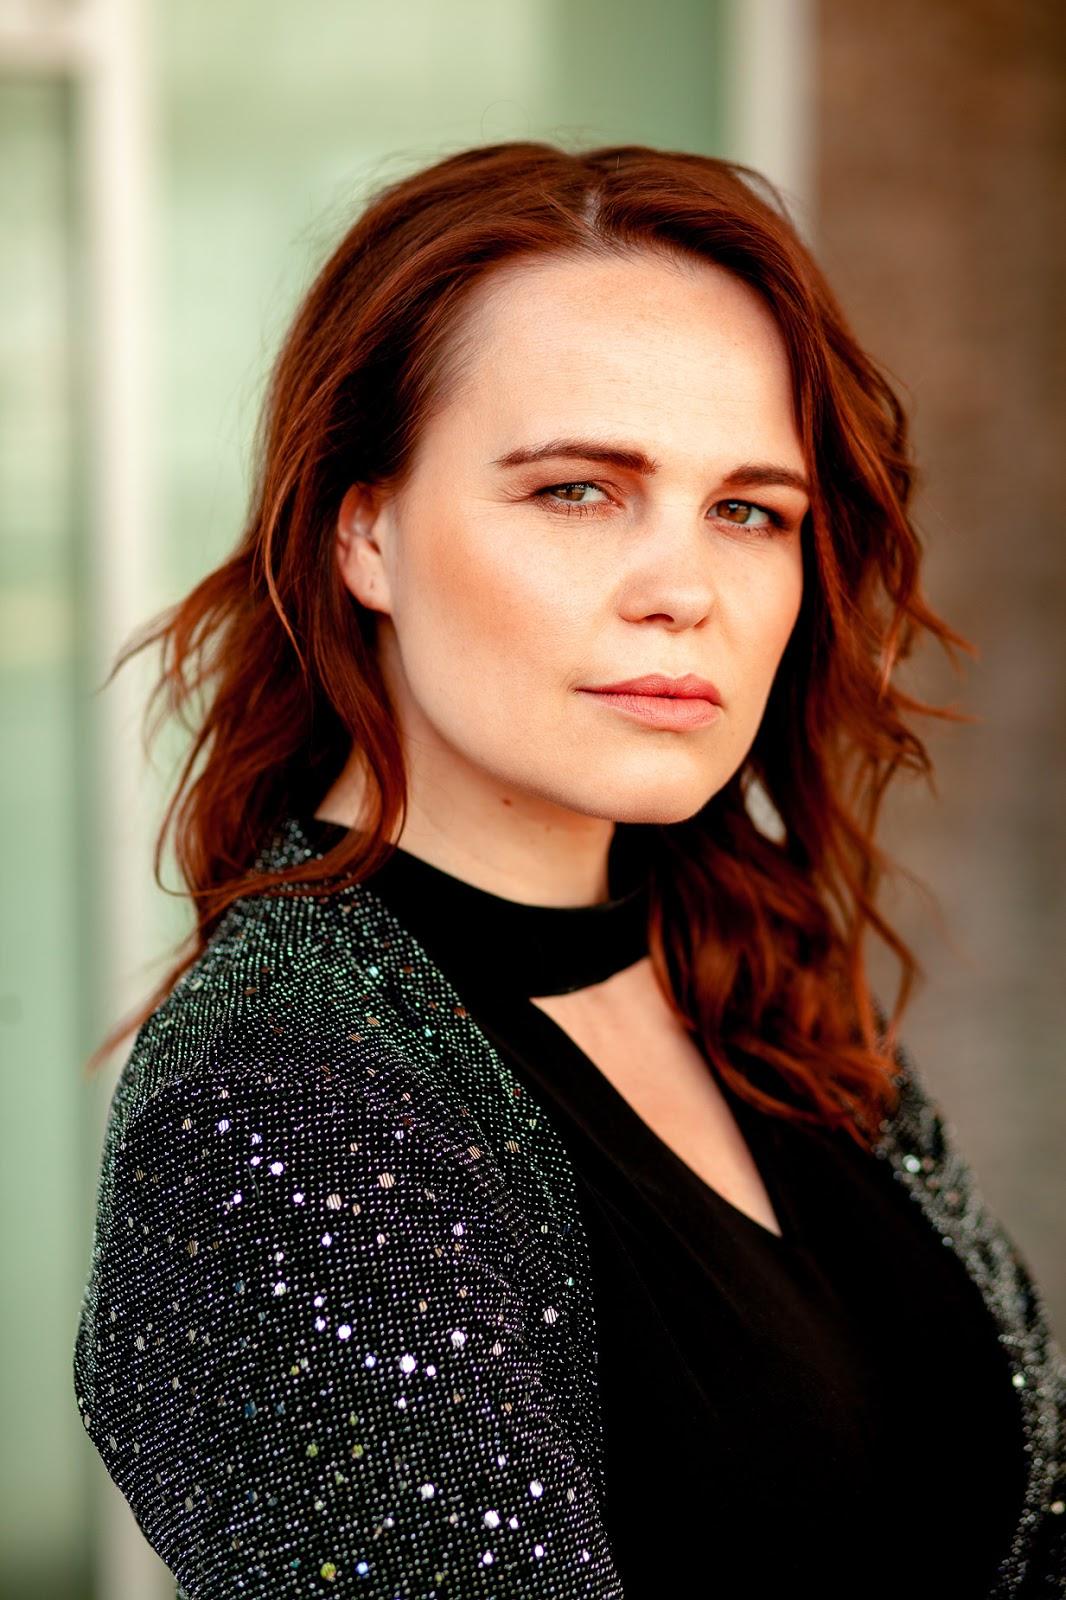 Natalie MacMahon